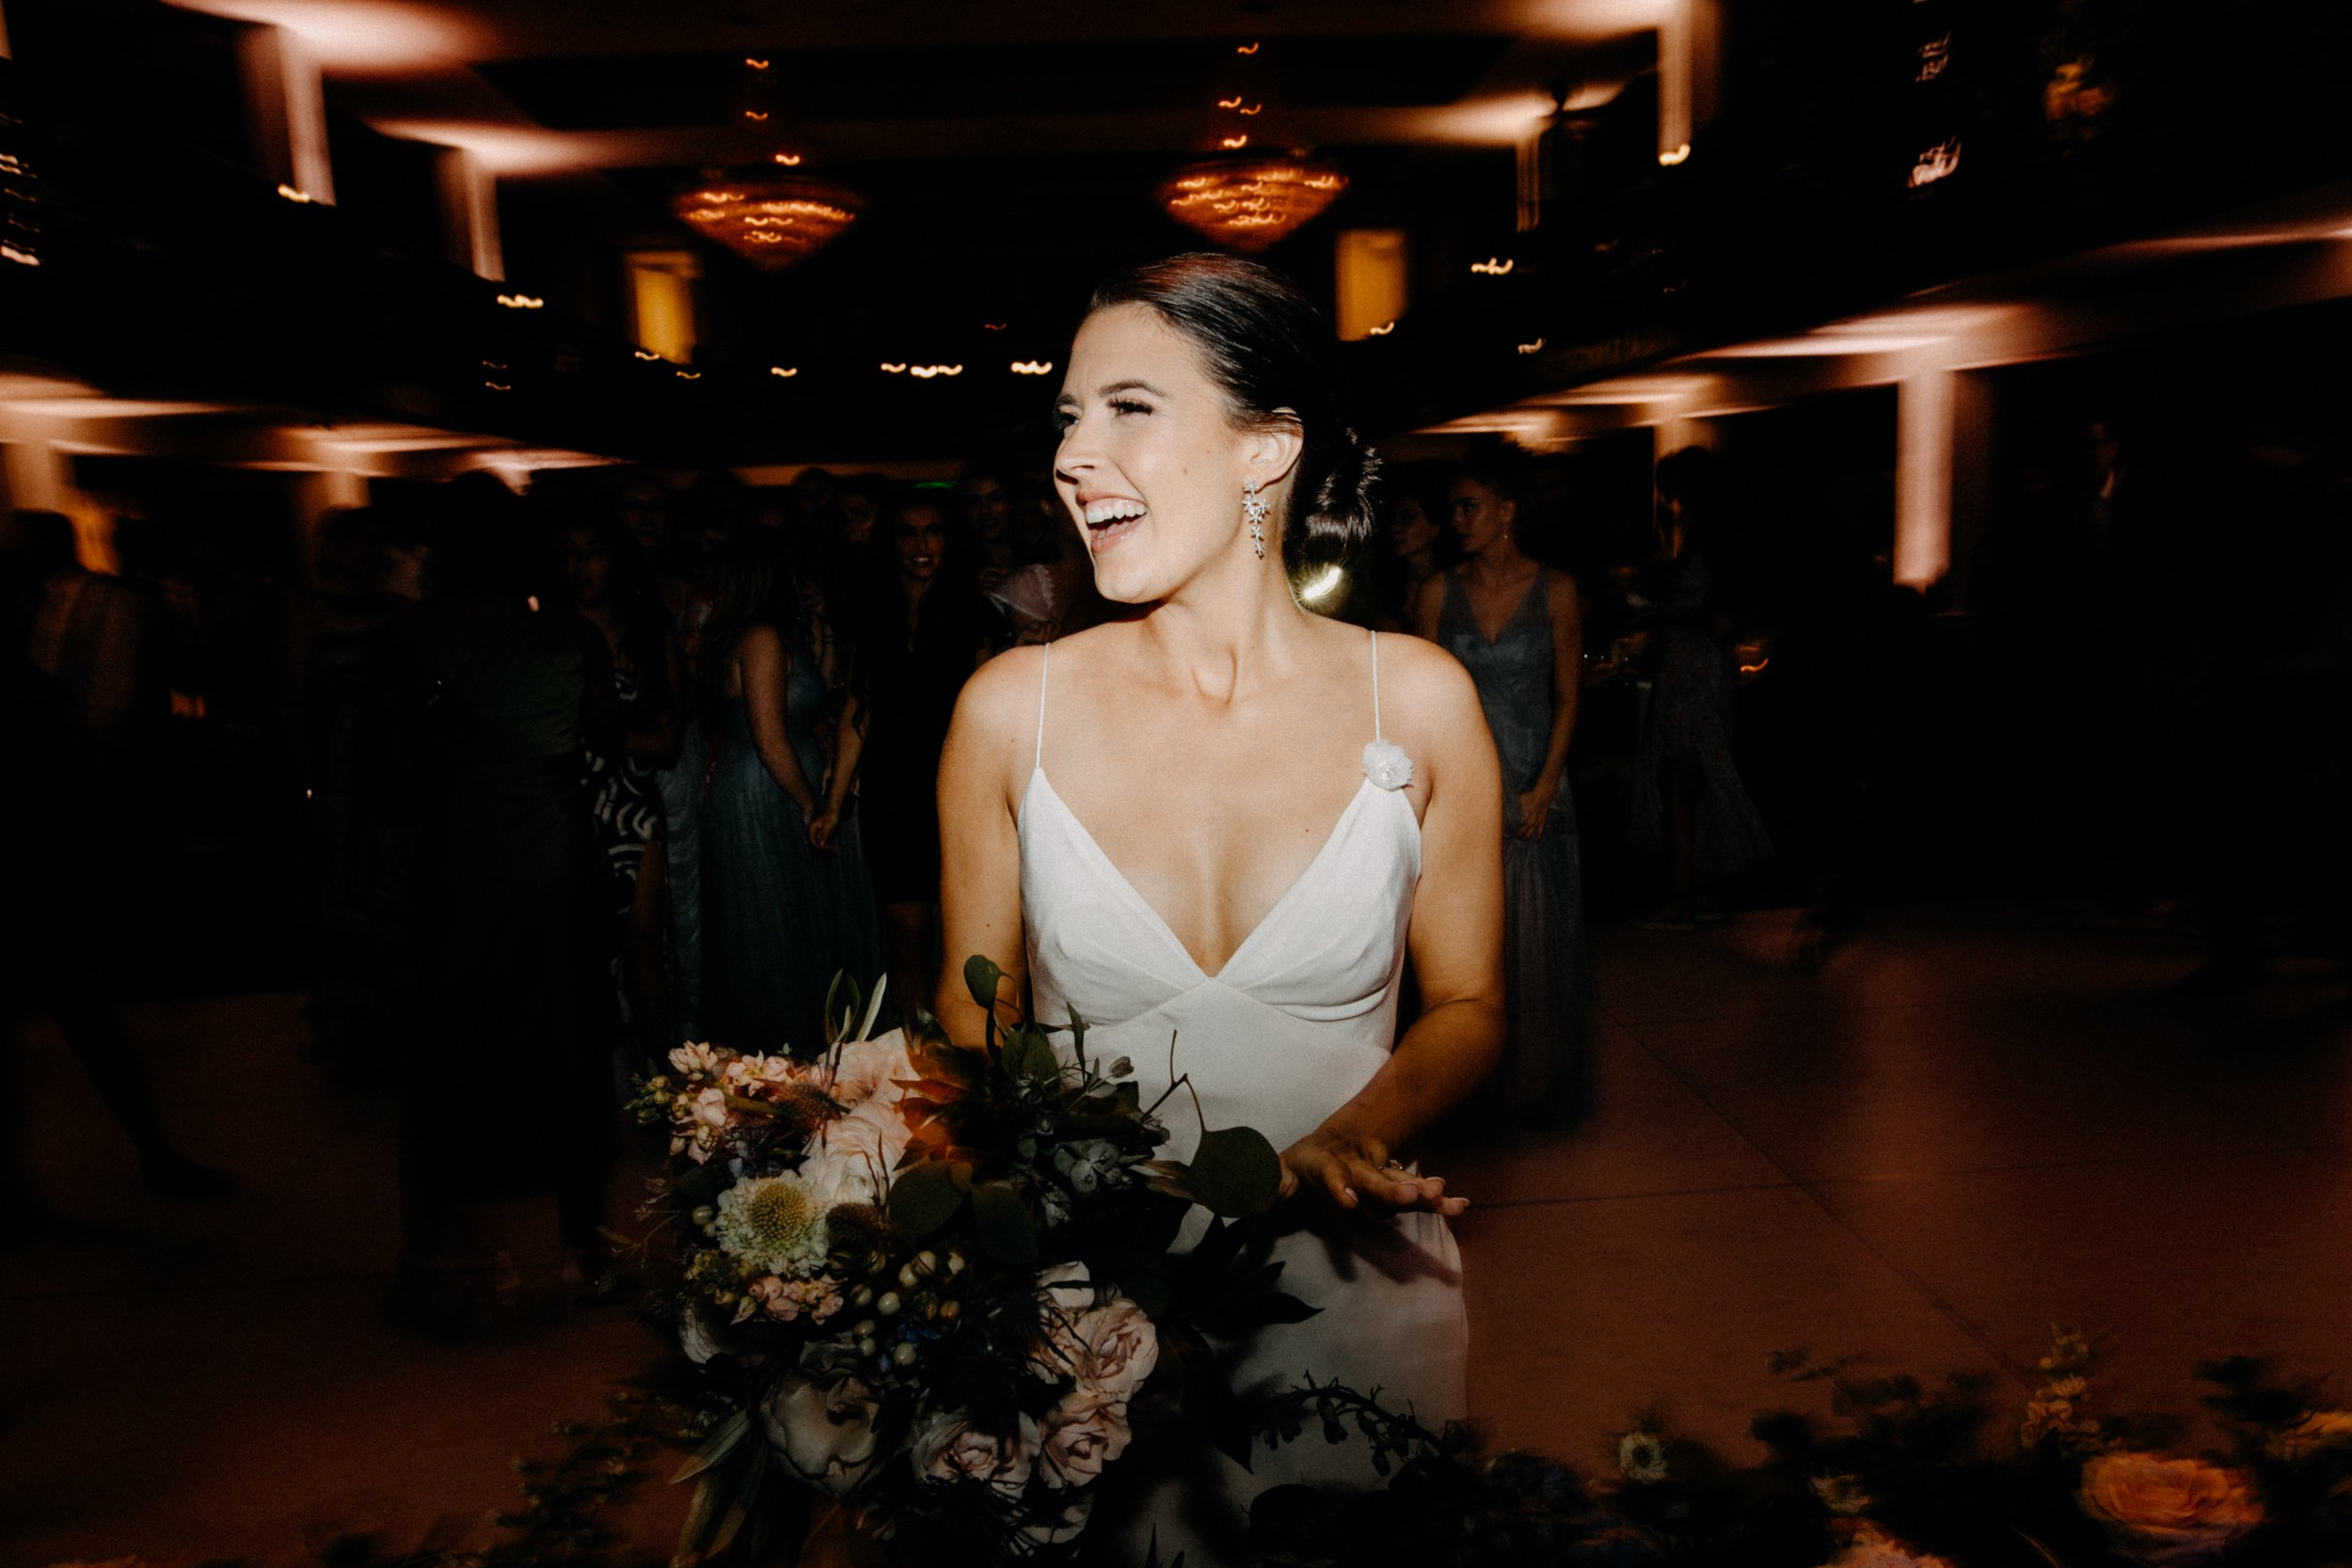 st-anthony-hotel-wedding-photography-10175san-antonio.JPG